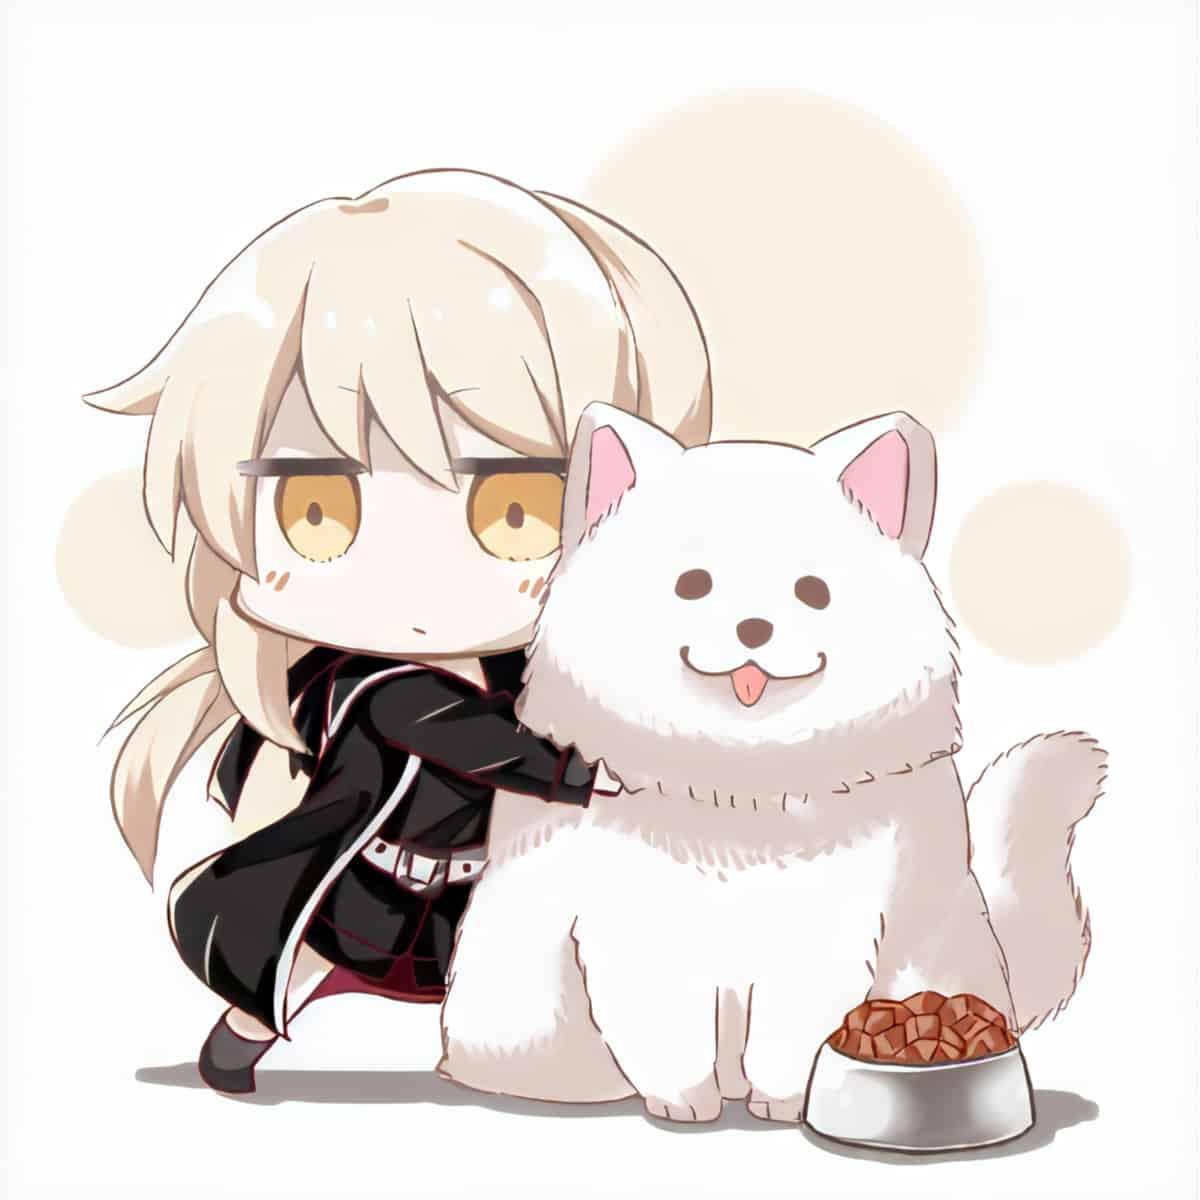 A blonde chibi anime girl hugging a white dog